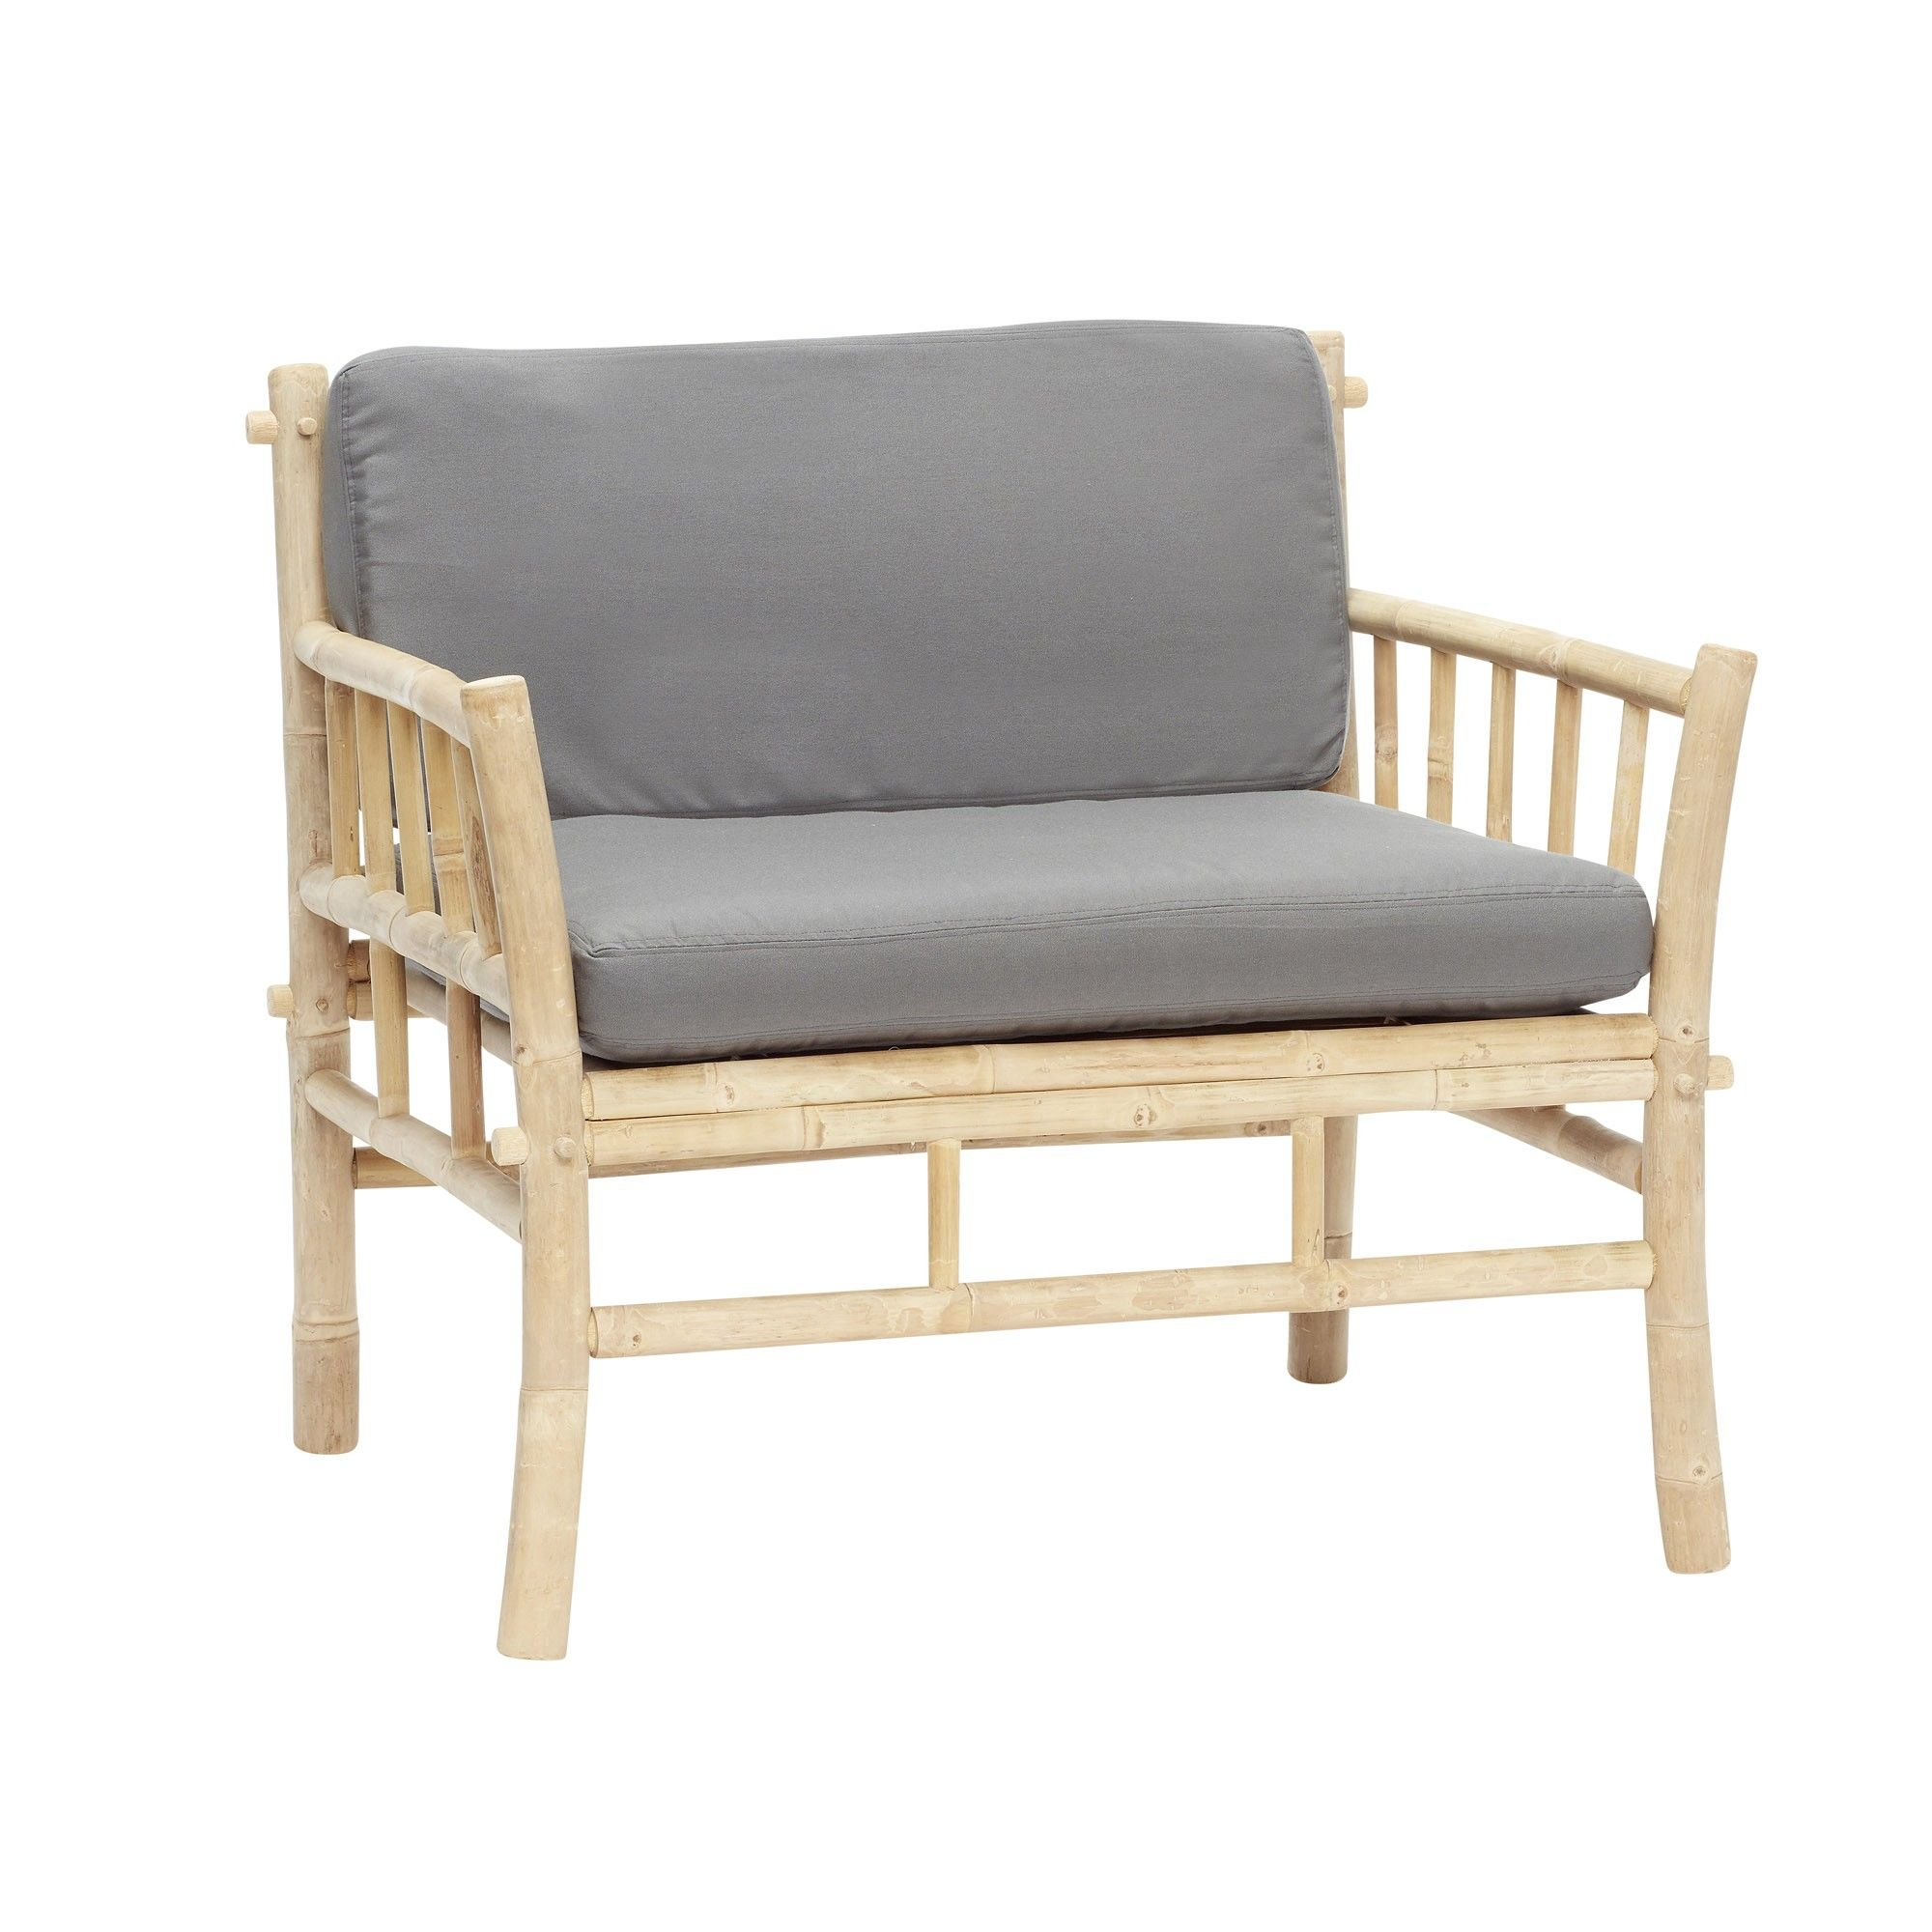 fauteuil bambou naturelgris hubsch - Fauteuil Bambou